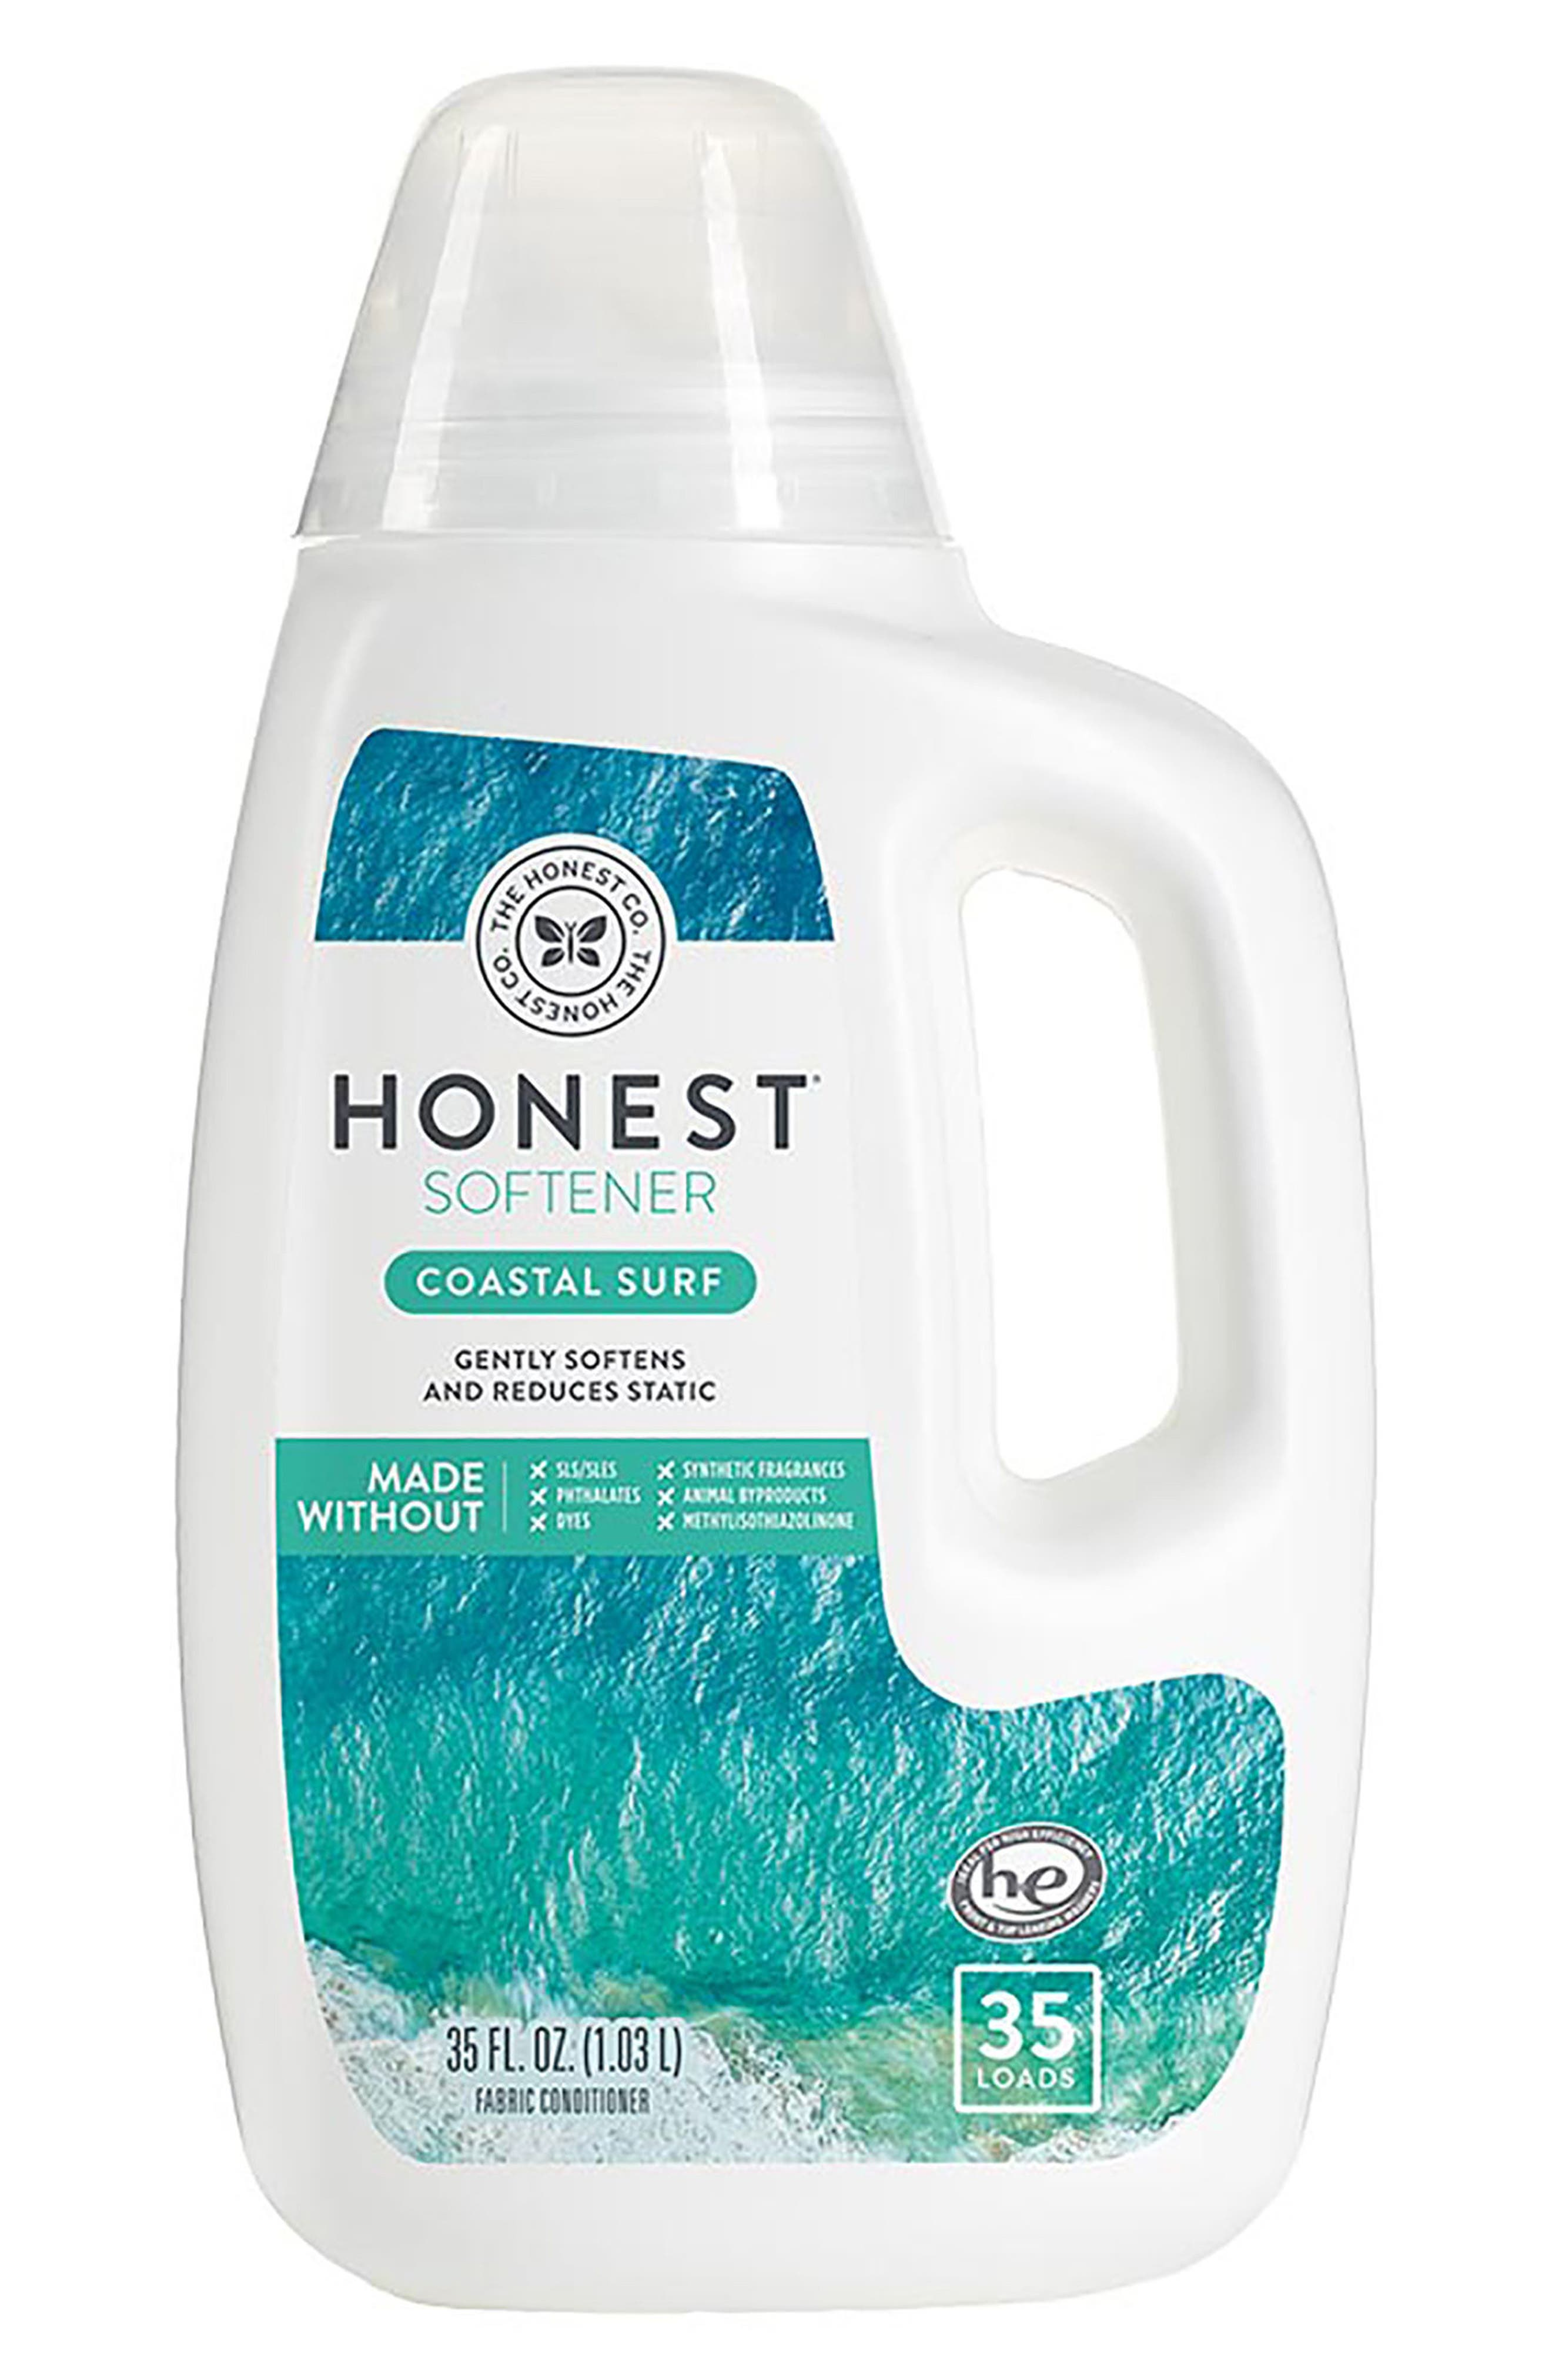 Alternate Image 1 Selected - The Honest Company Coastal Surf Fabric Softener